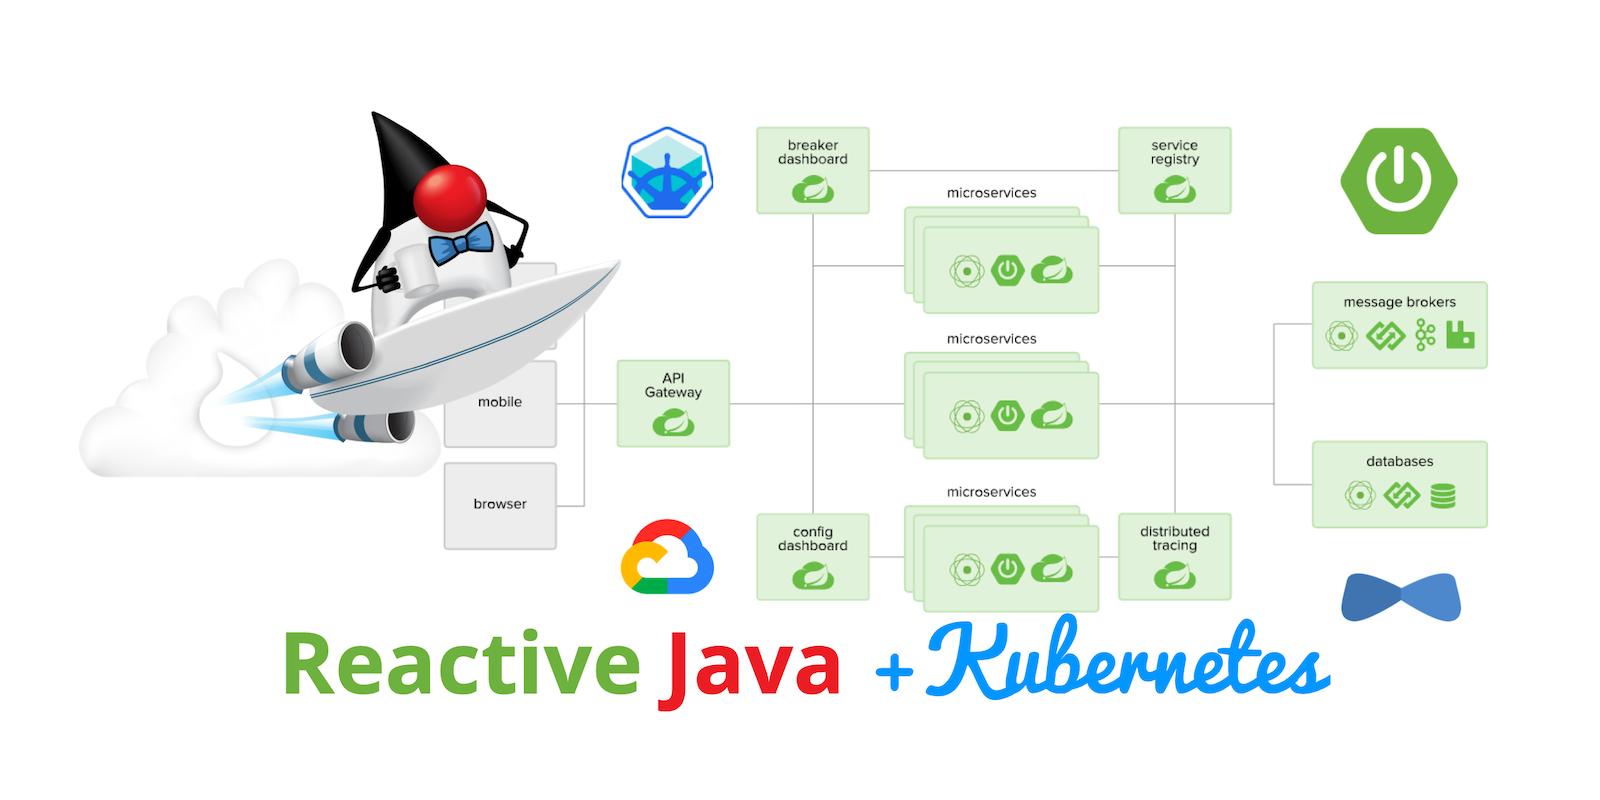 Reactive Java Kubernetes